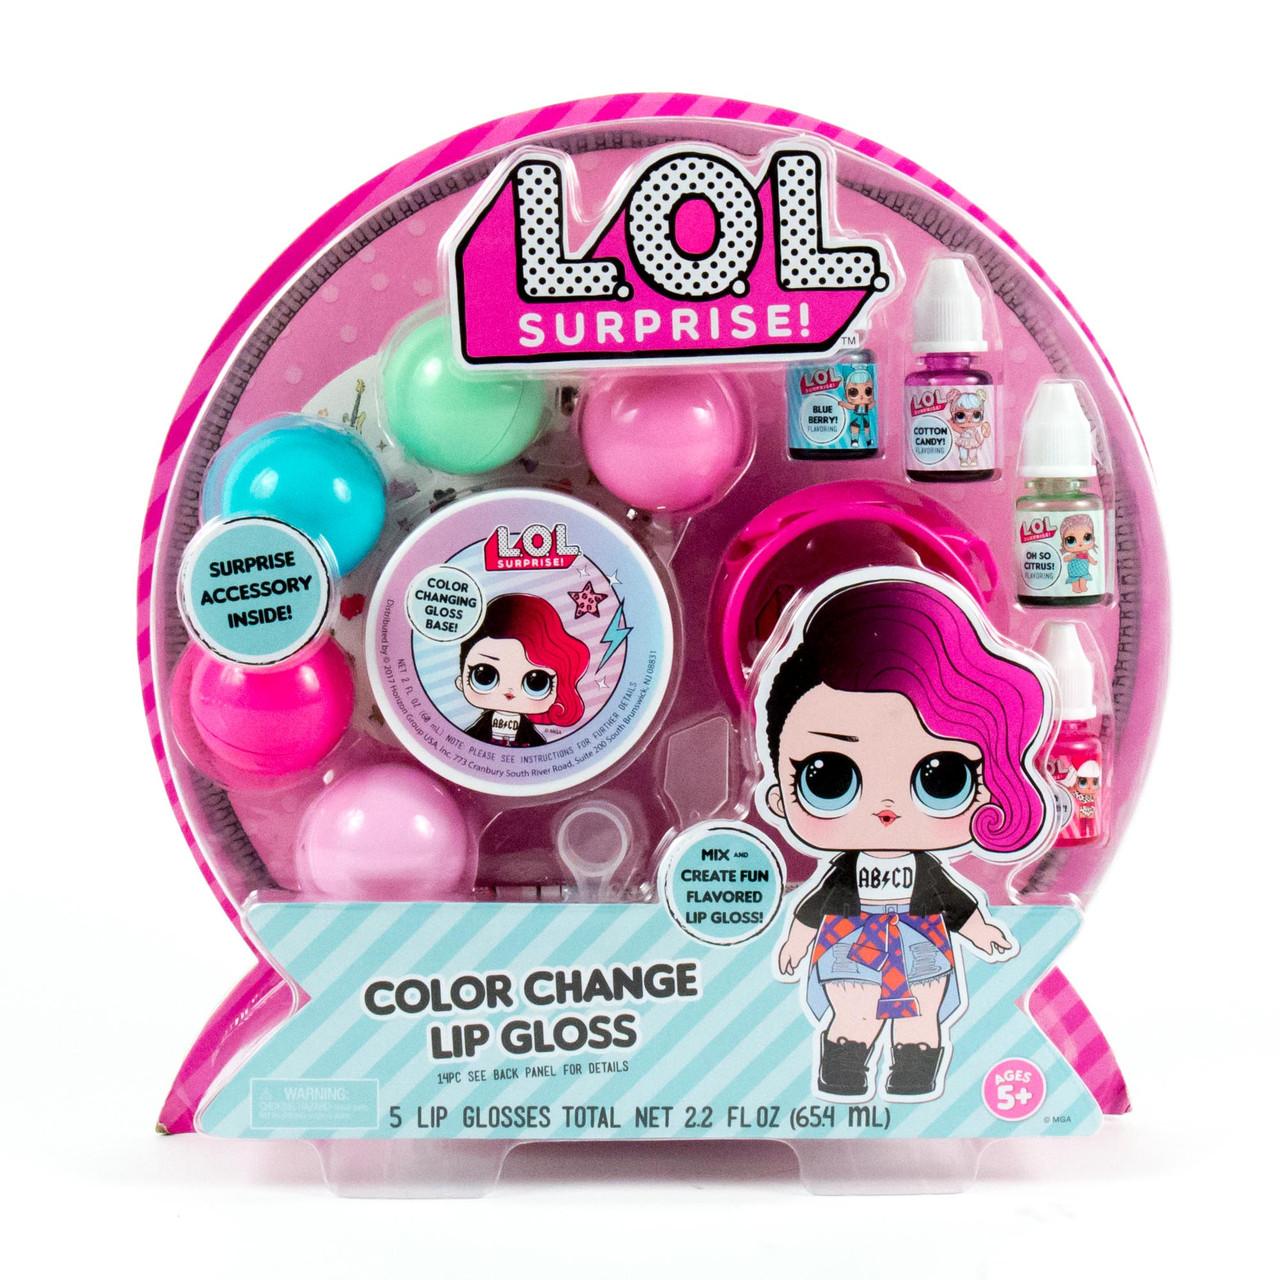 L.O.L. Surprise! Набор косметики блеск для губ 84669 Color Change Lip Gloss Kit